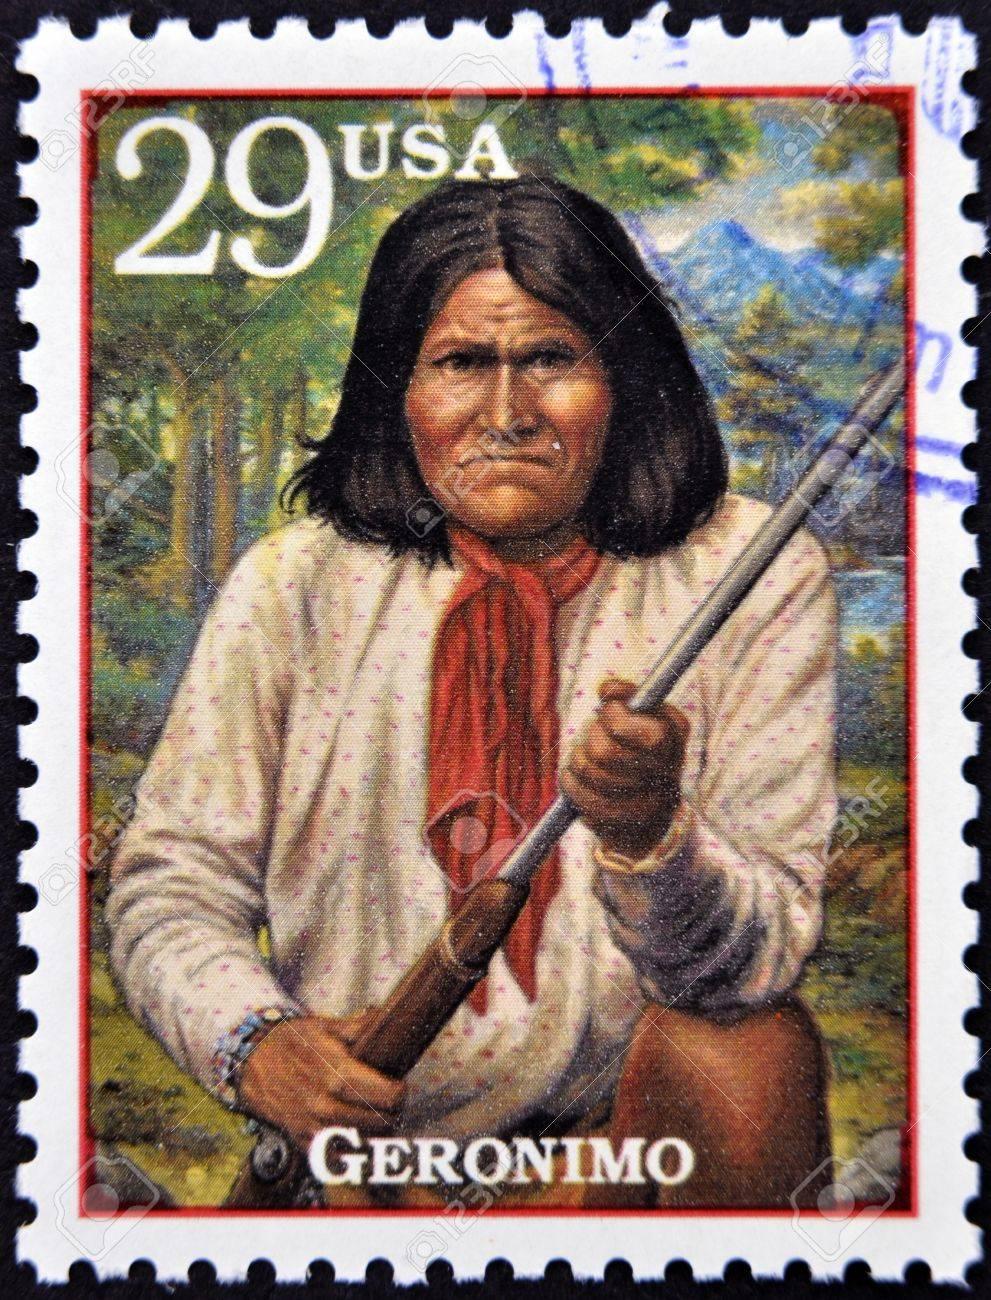 UNITED STATES OF AMERICA CIRCA Stamp Printed In USA Show - Show me the united states of america